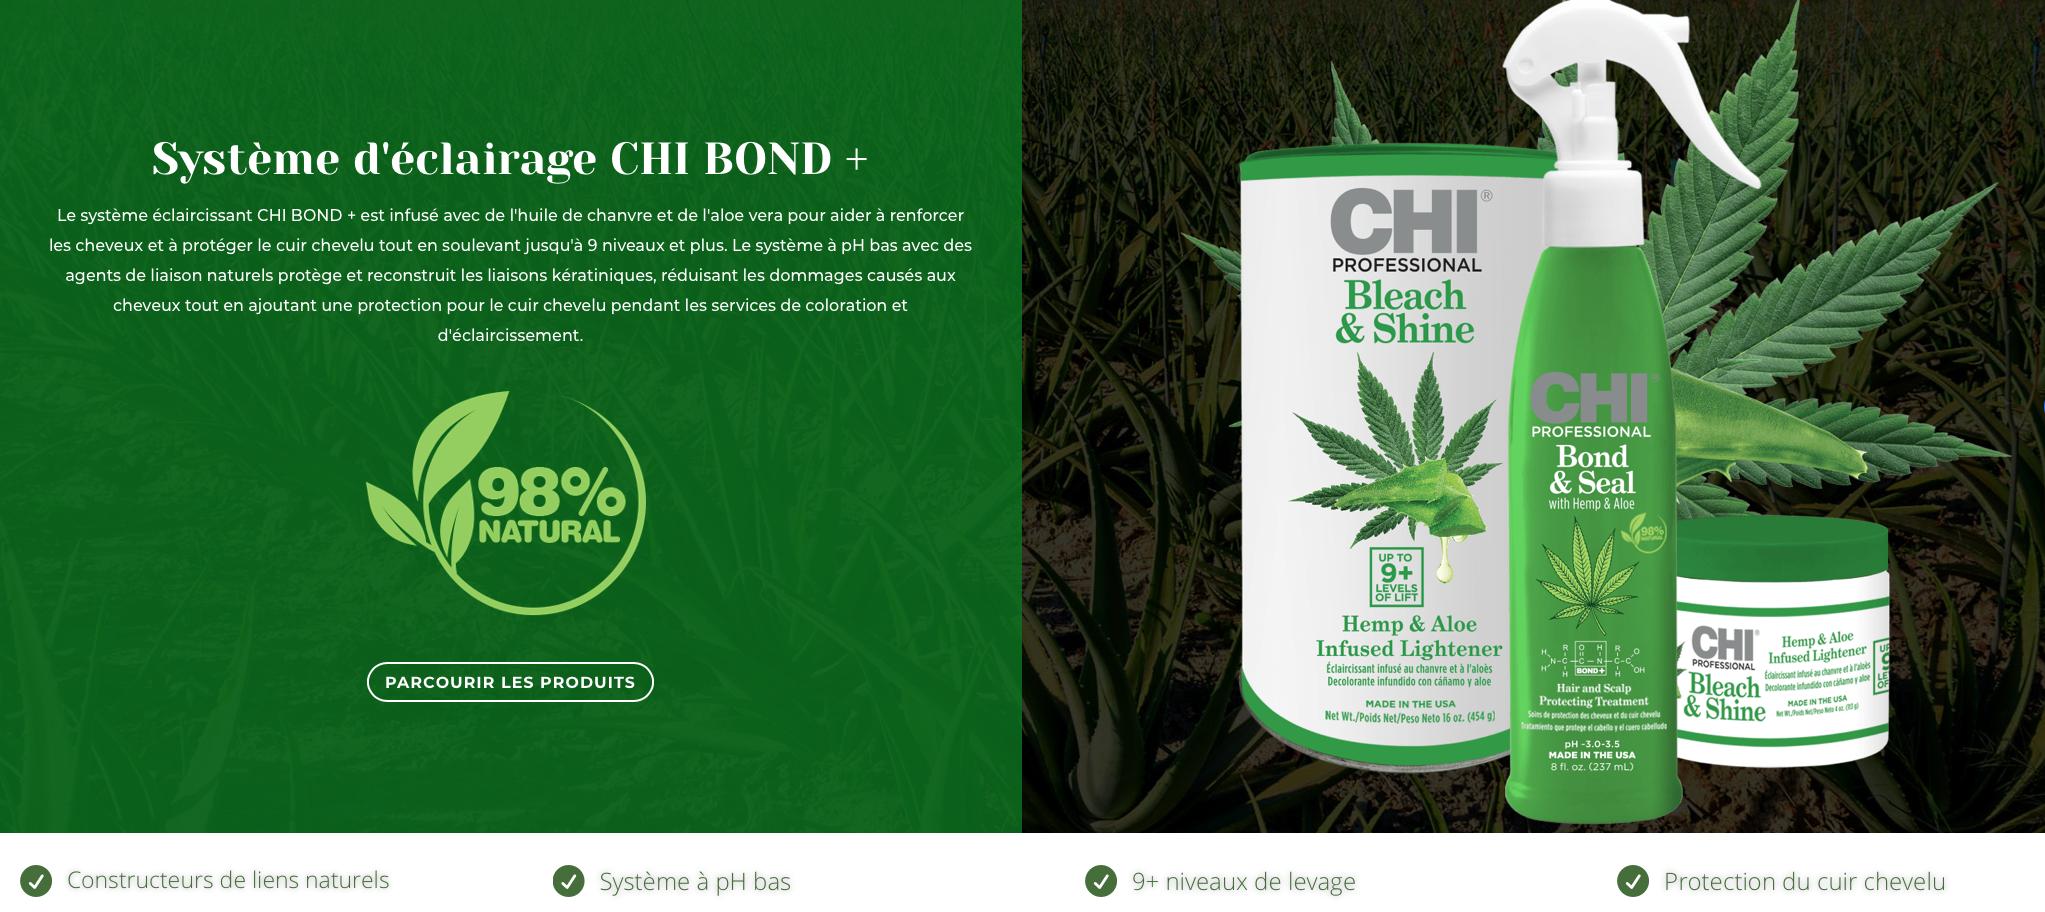 CHI Bond